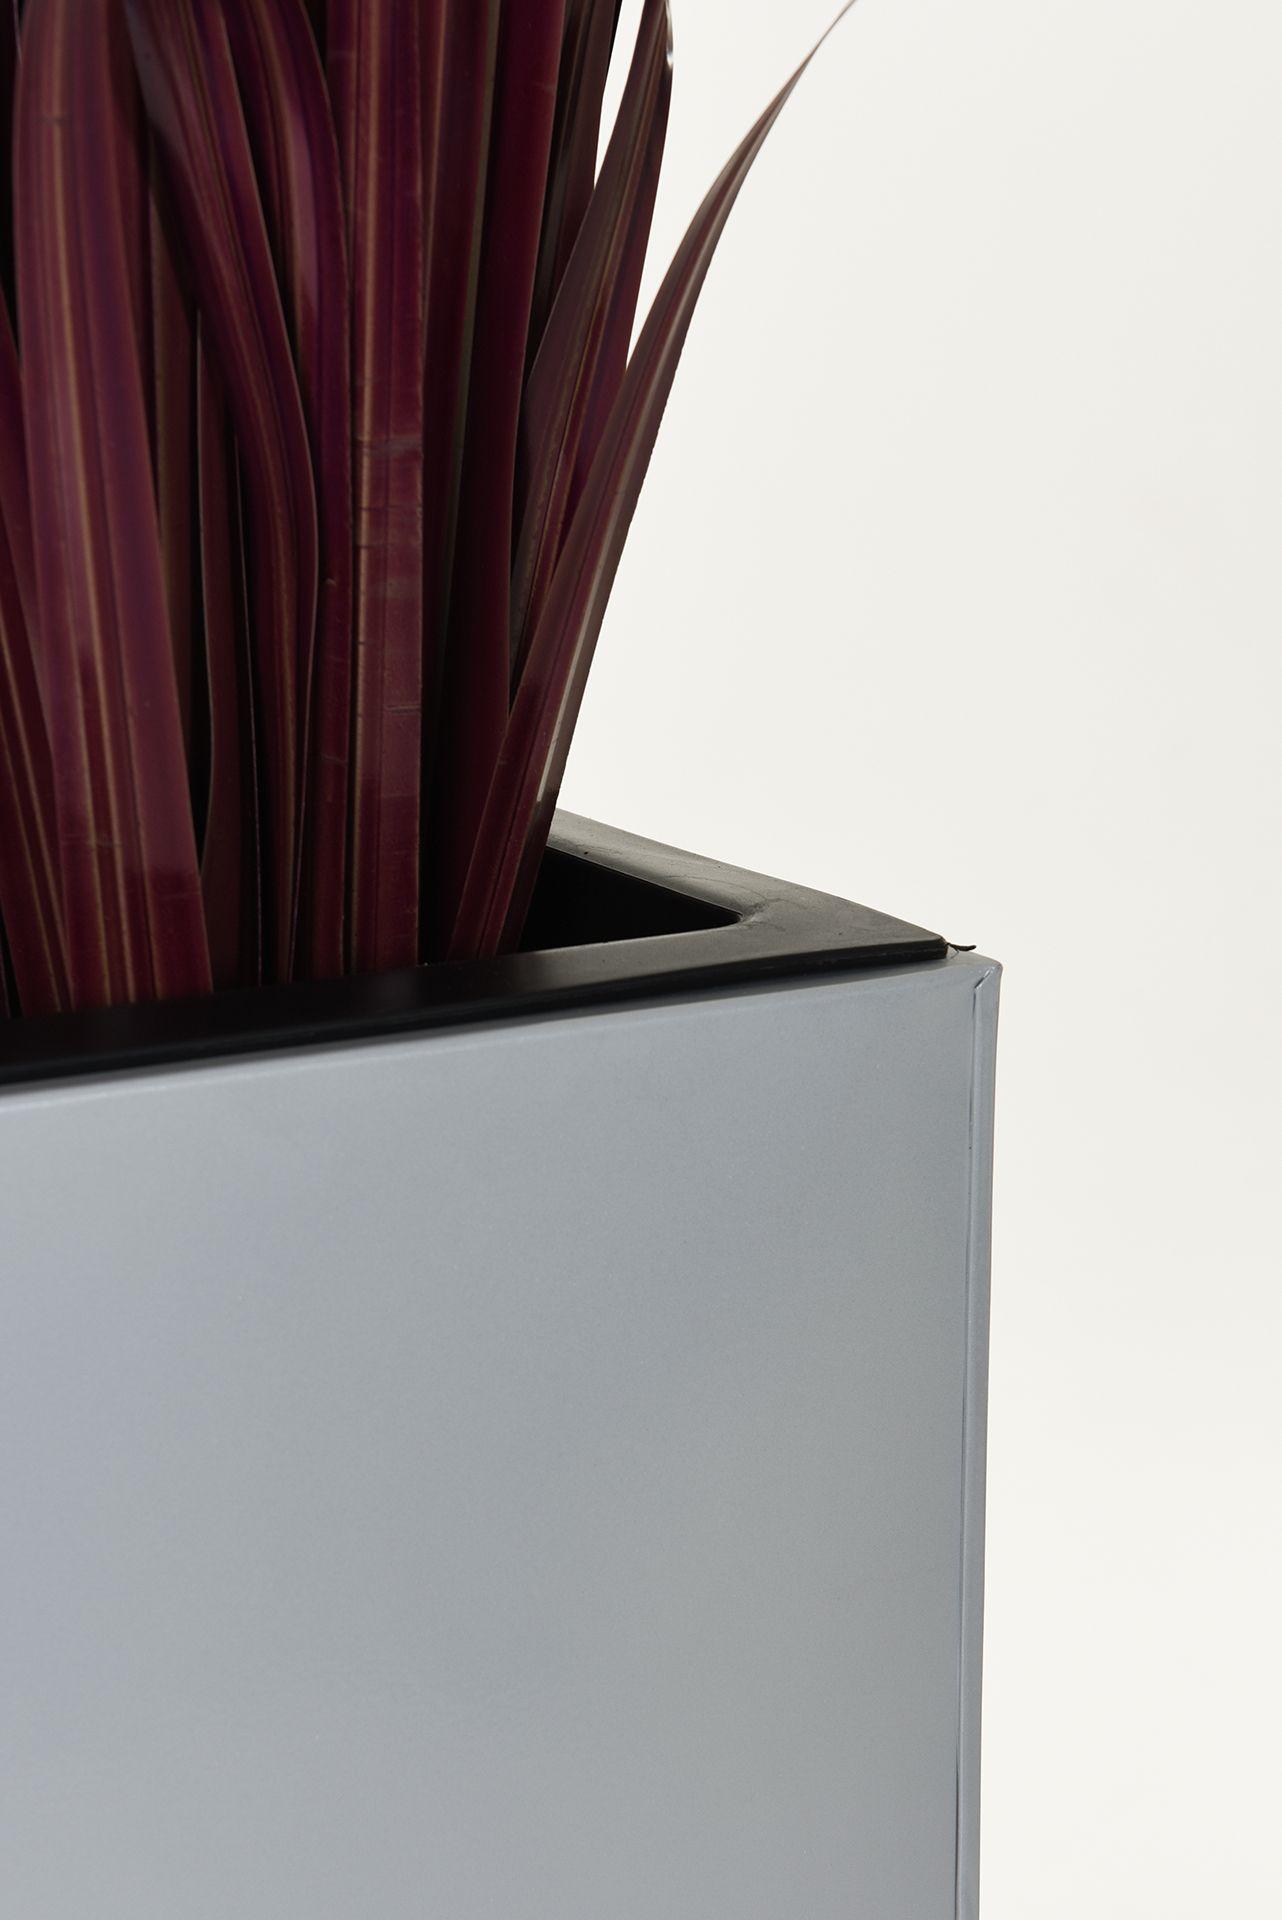 pflanzk bel block 100 cm pulverbeschichtetes stahlblech. Black Bedroom Furniture Sets. Home Design Ideas